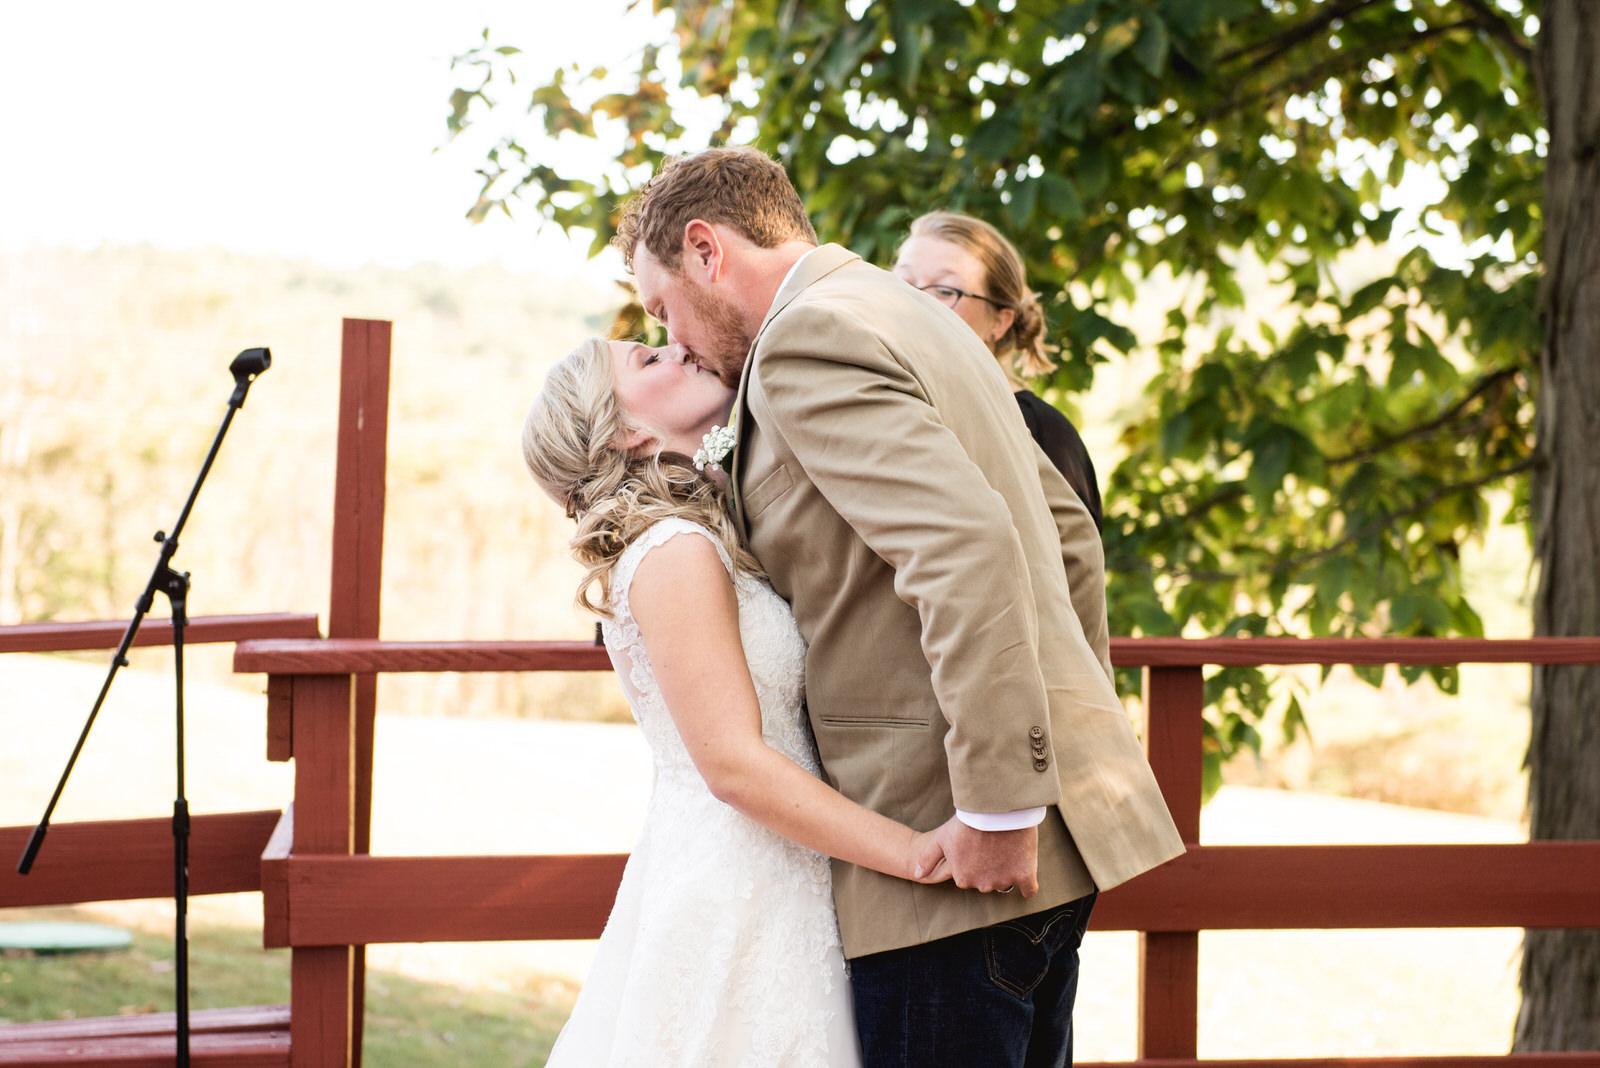 wedding_at_red_fox_winery_wedding_photographer020.jpg